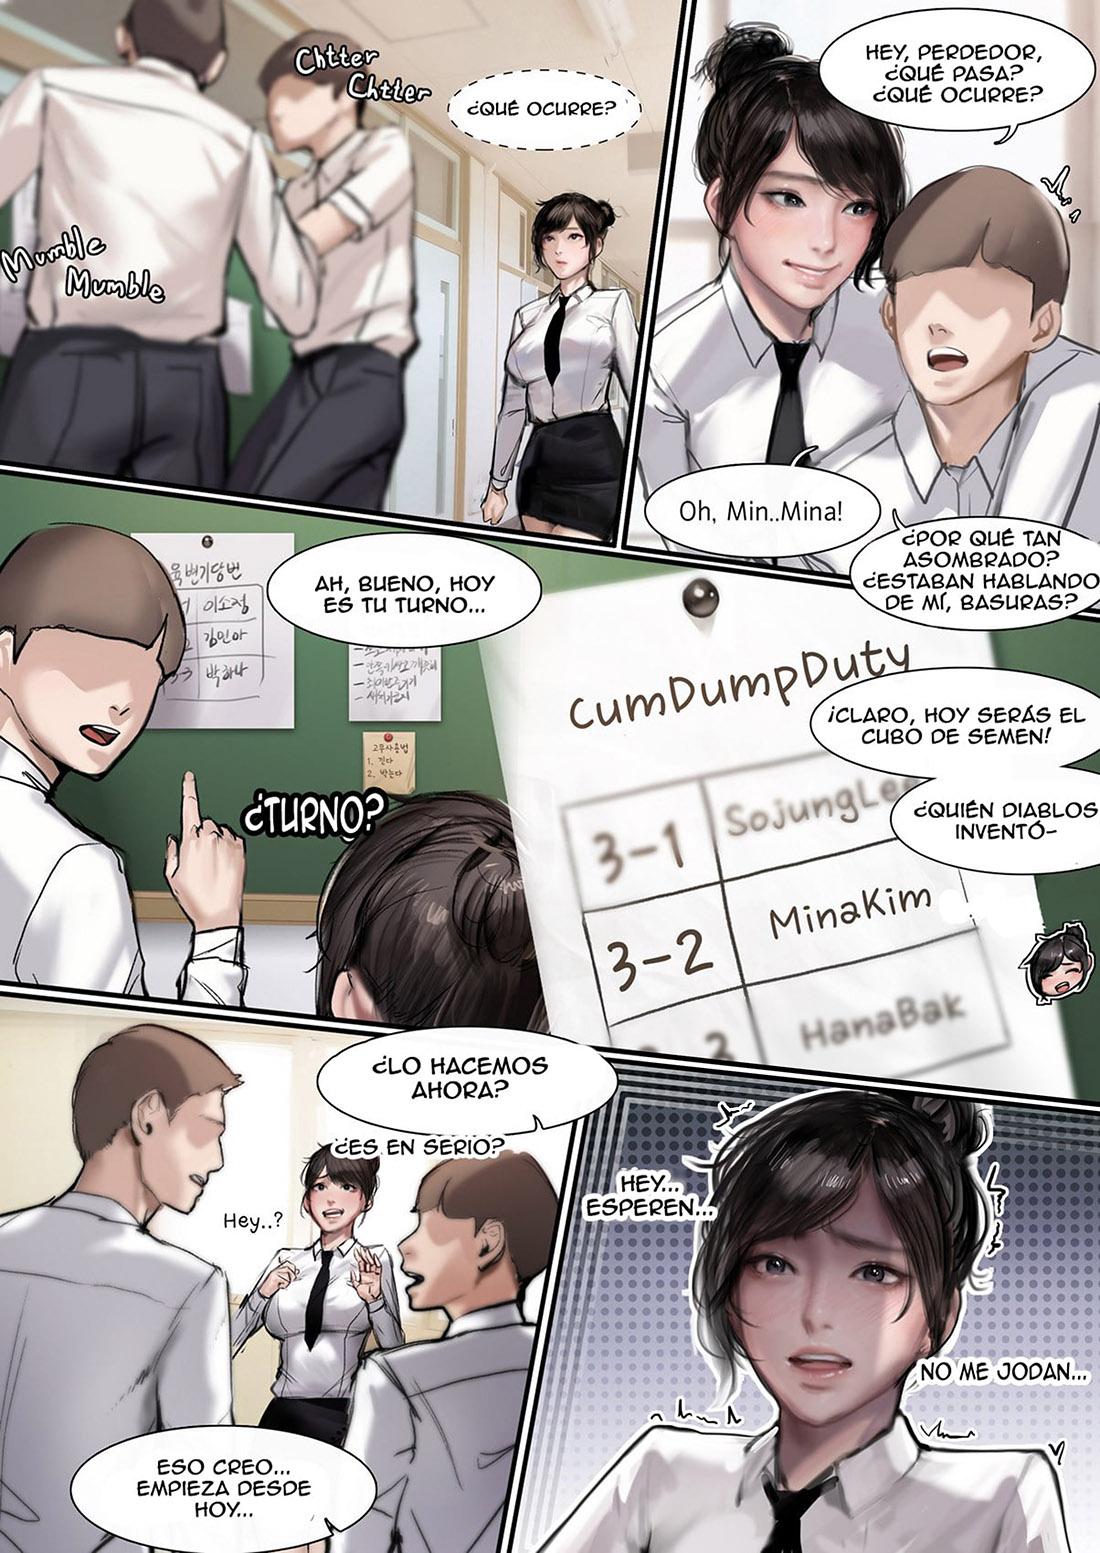 JK-CUMDUMP Development Diary